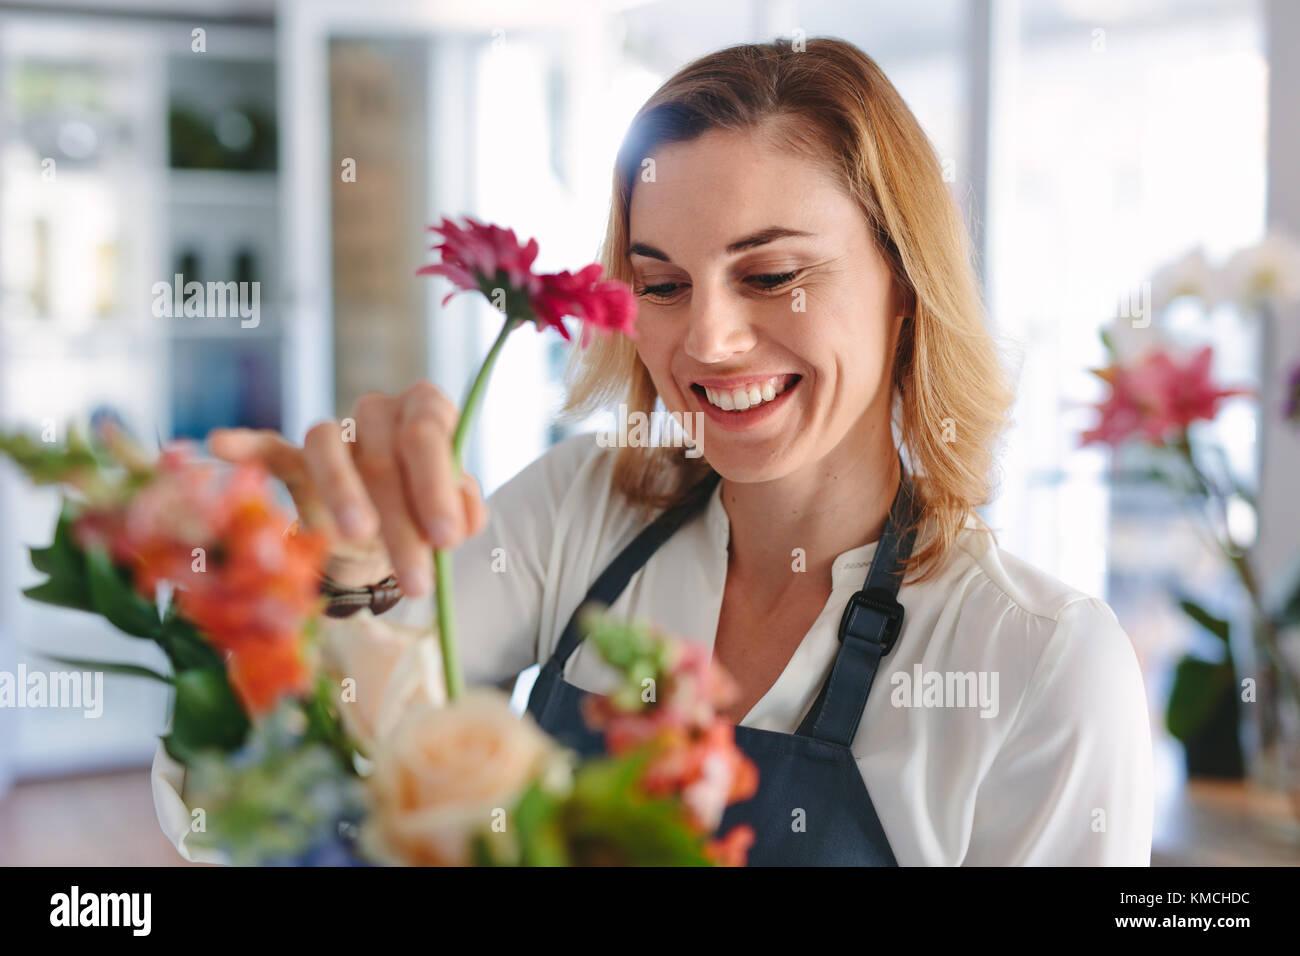 Female florist arranging flowers. Woman flower shop owner placing flowers in a bouquet. Stock Photo